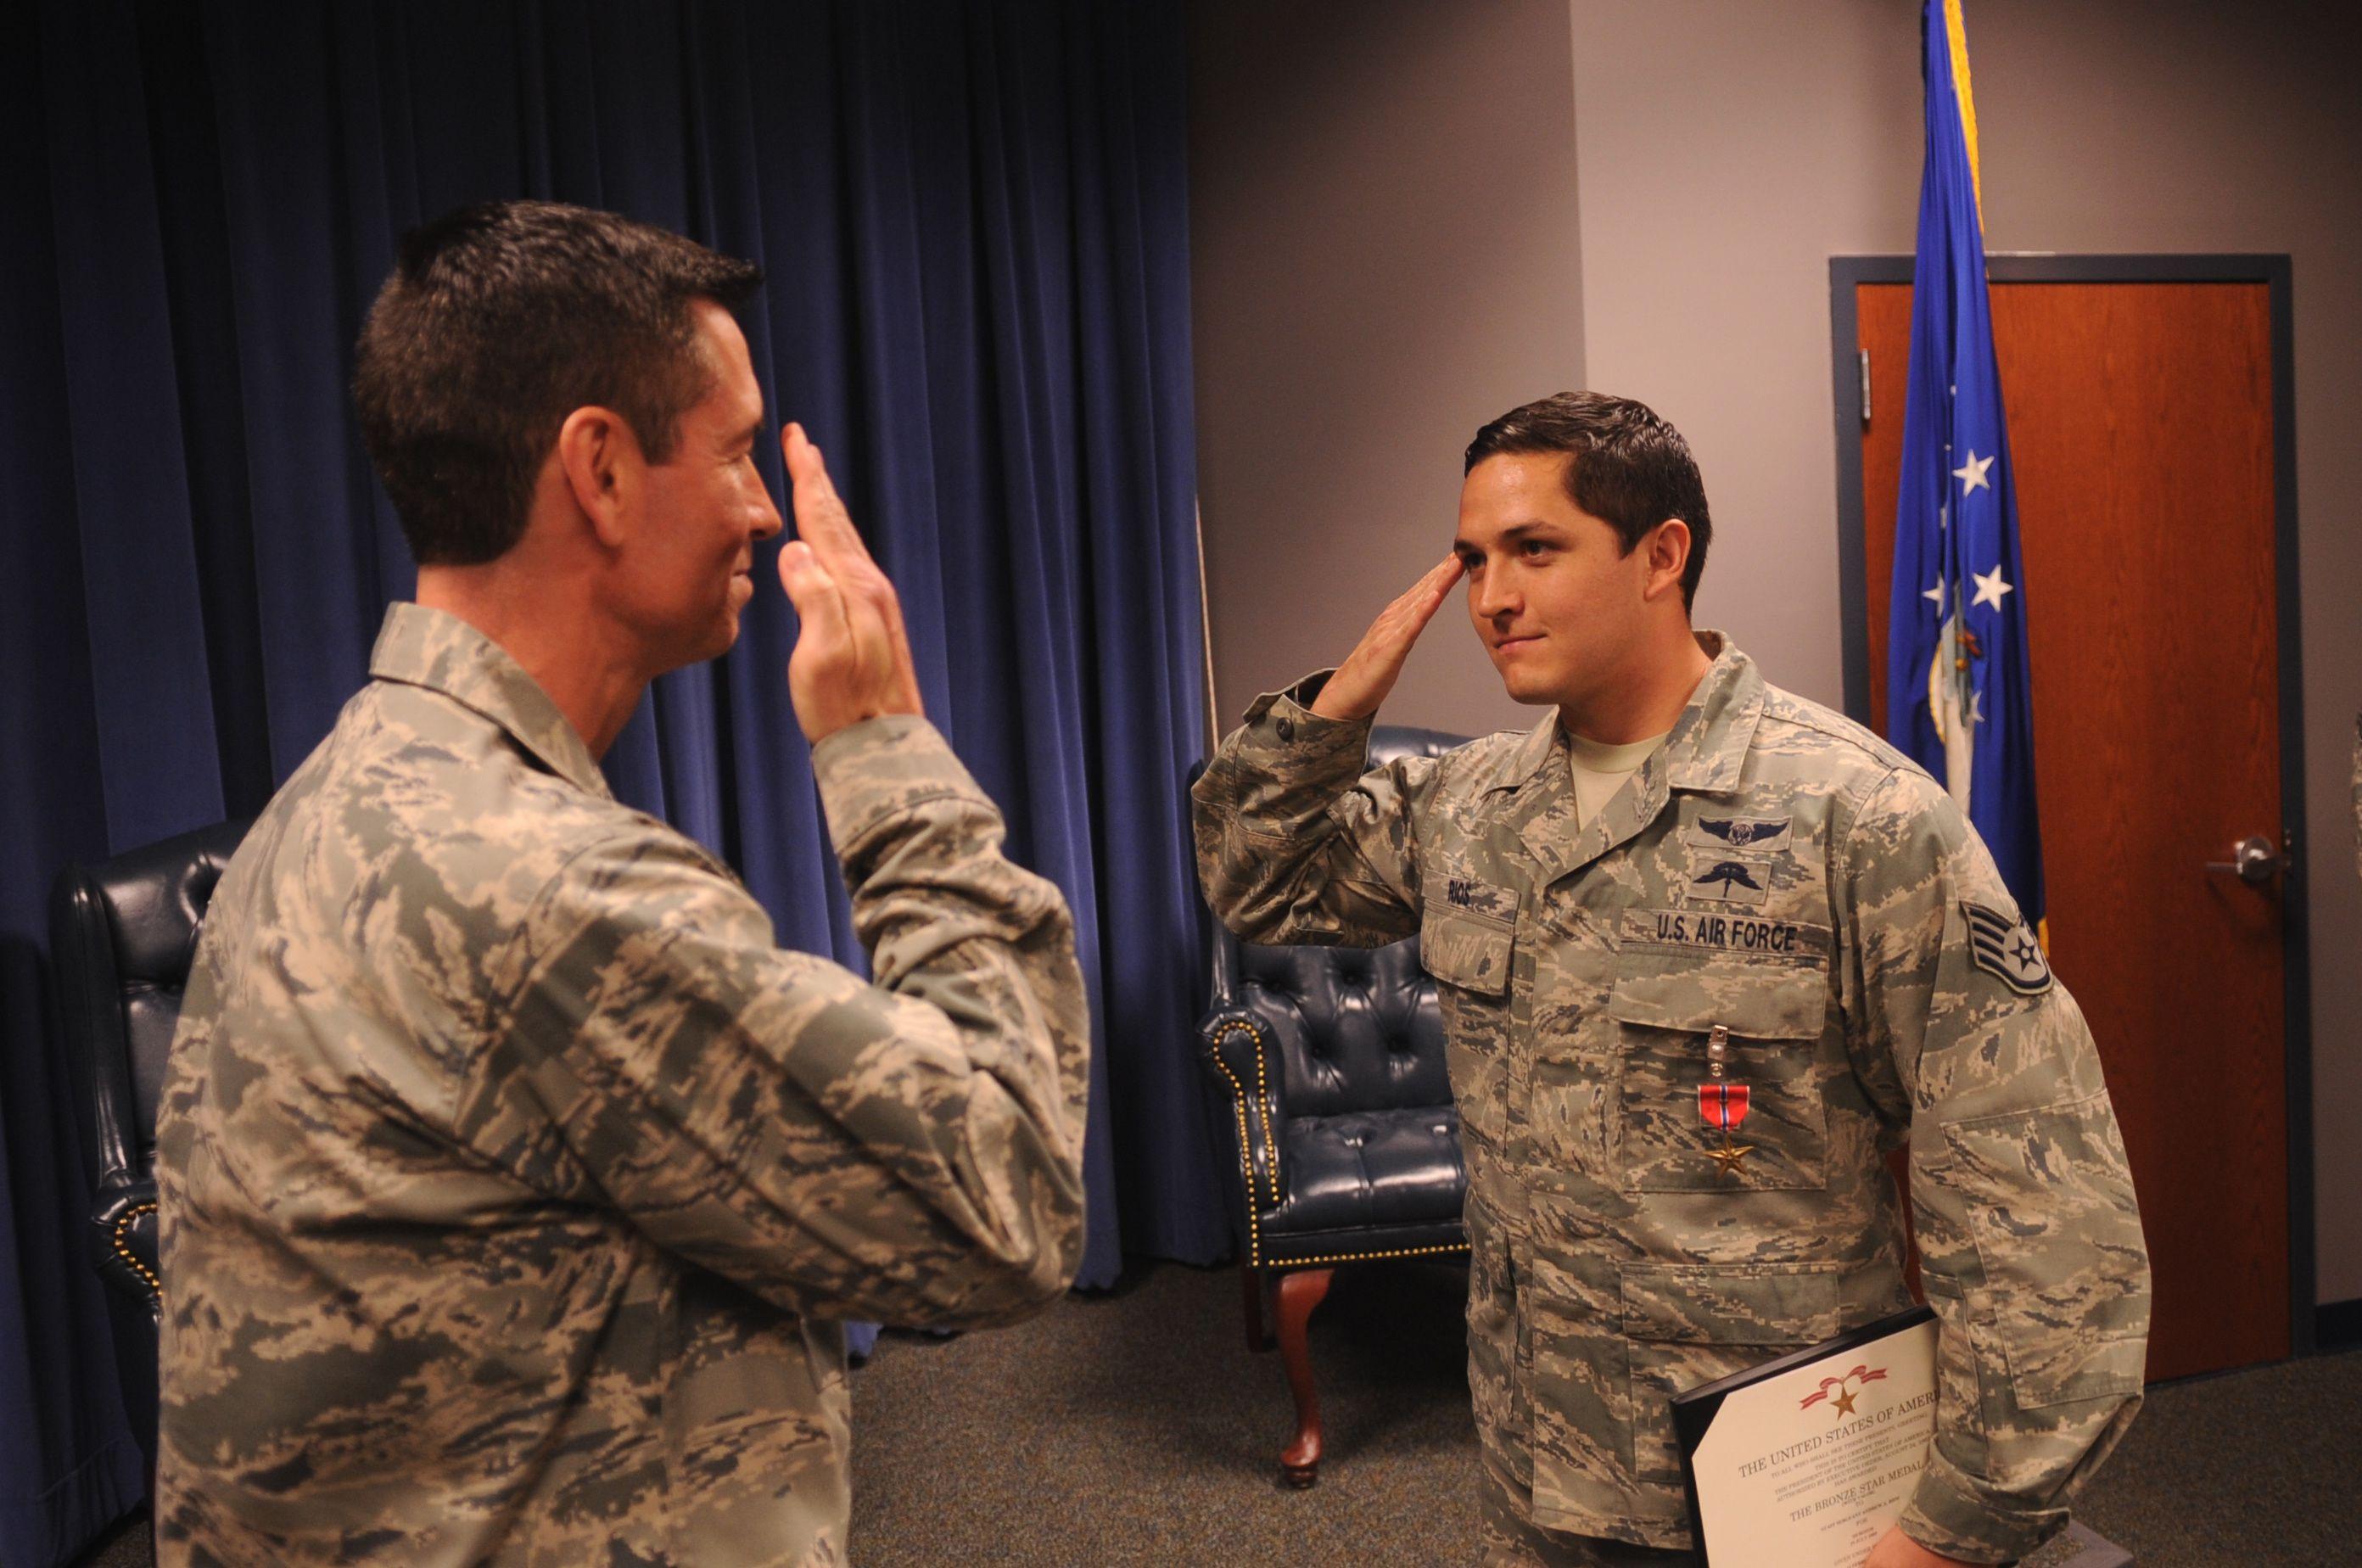 Tom kennedy us army claims service - Tom Kennedy Us Army Claims Service 49